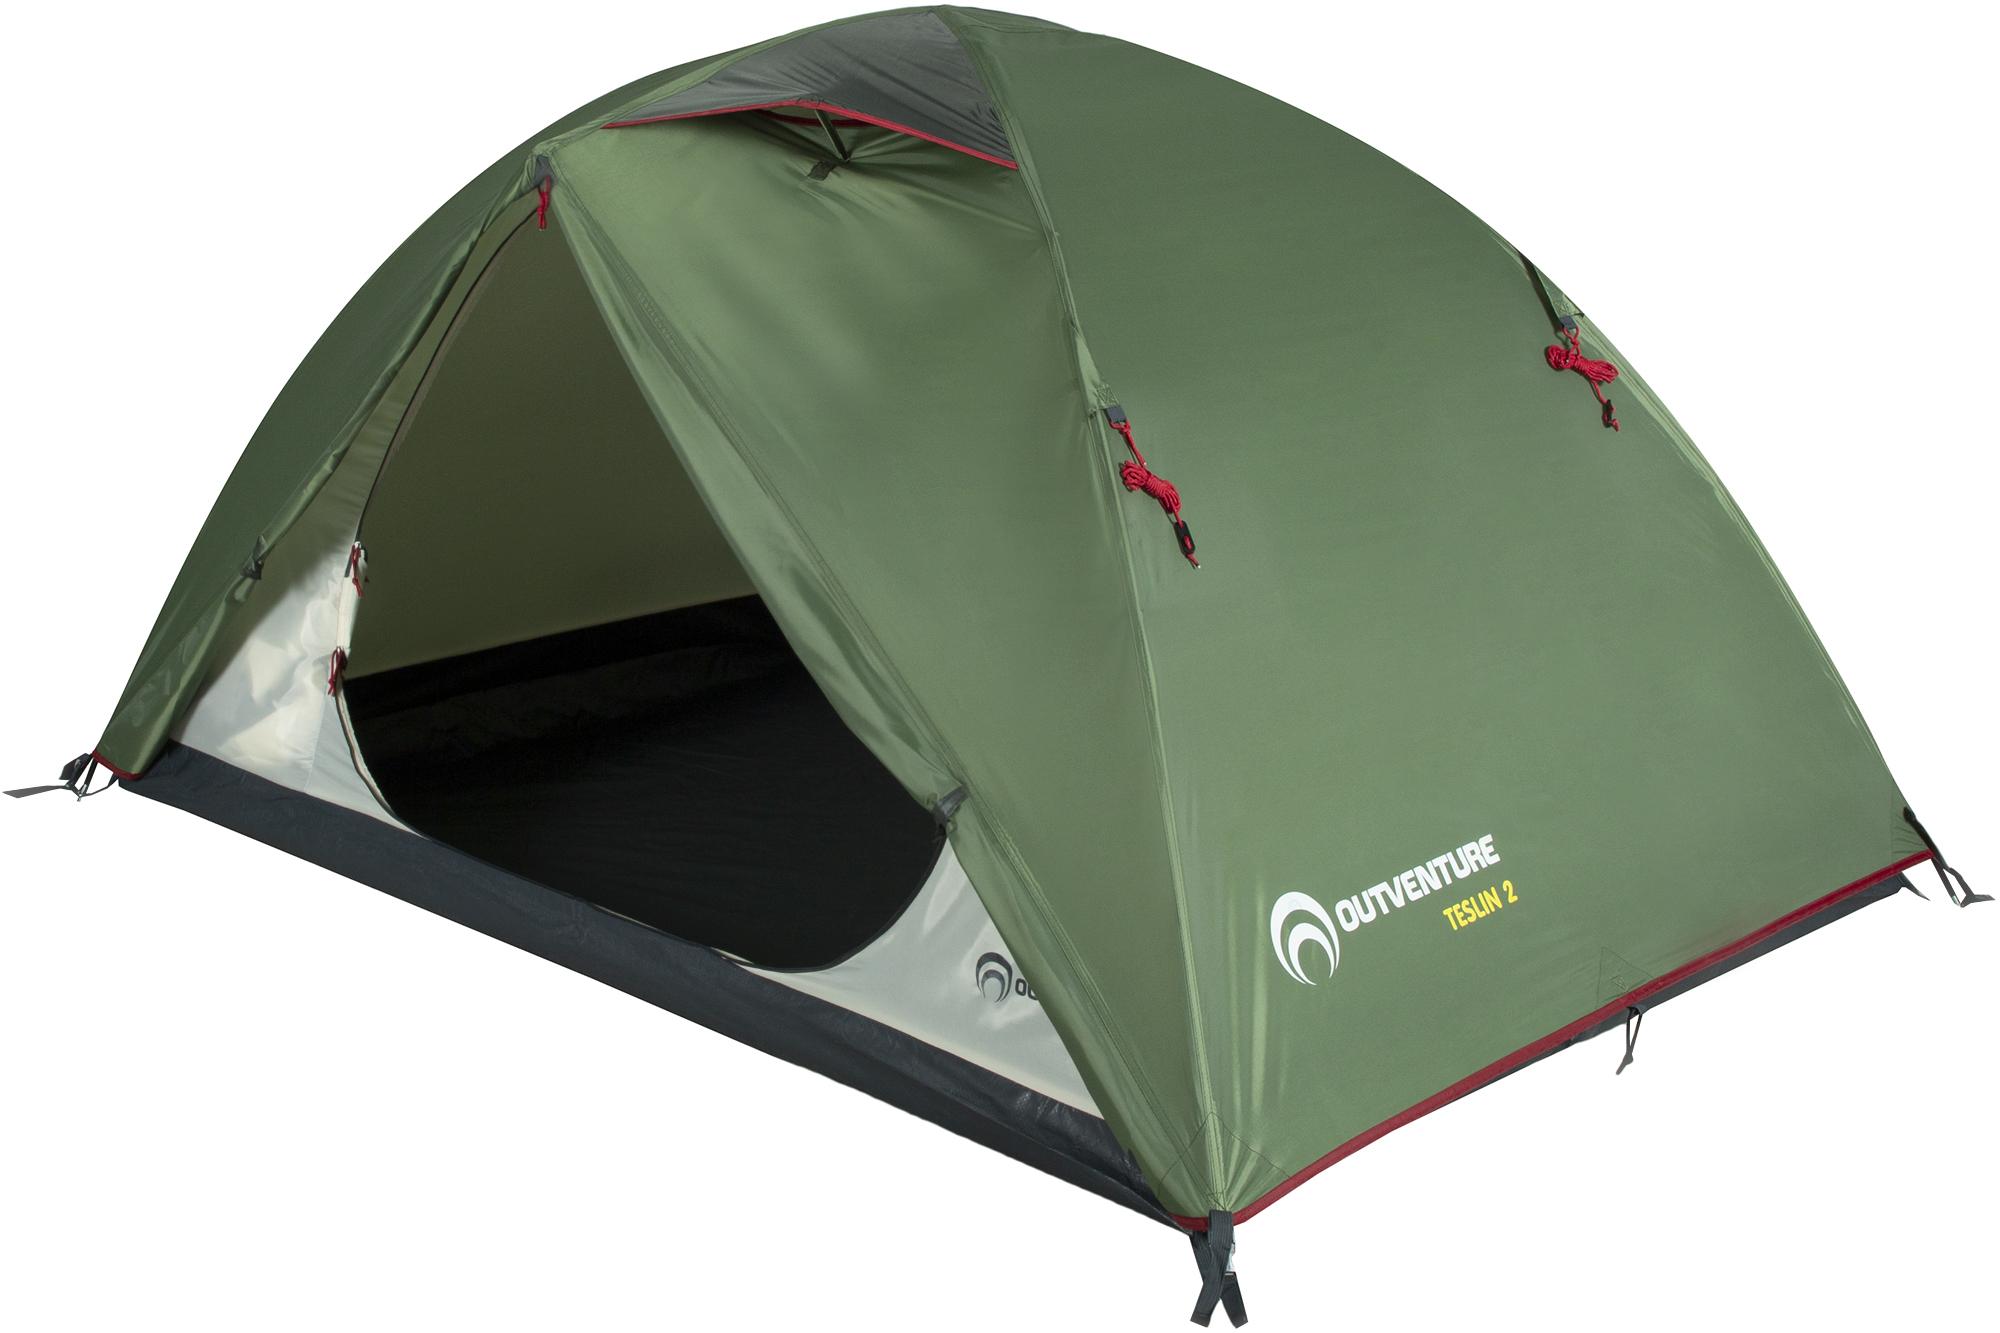 Outventure Teslin 2 палатка туристическая maverick ideal 400